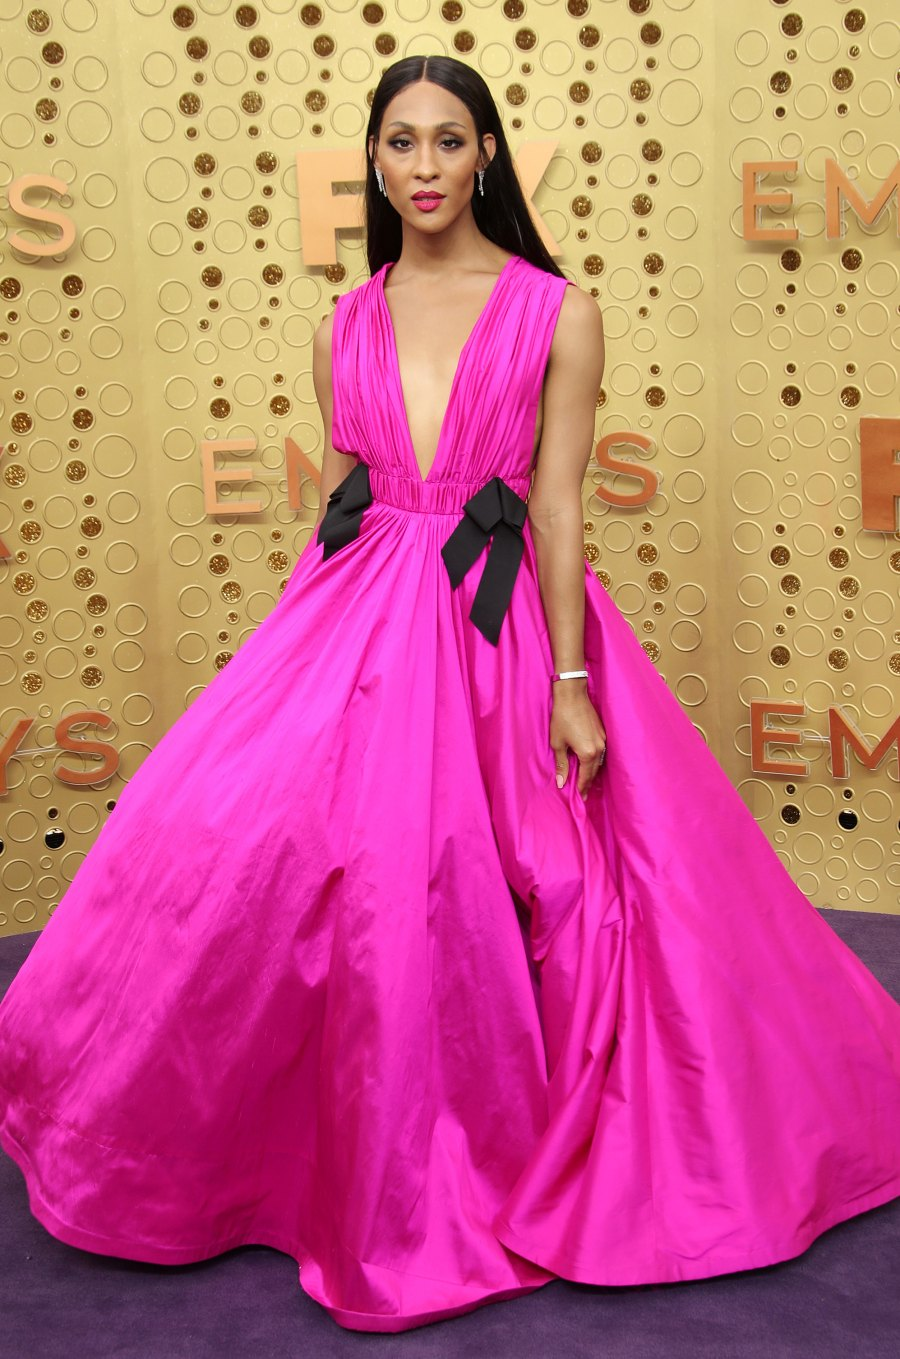 Emmys 2019 Nearly Naked - MJ Rodriguez